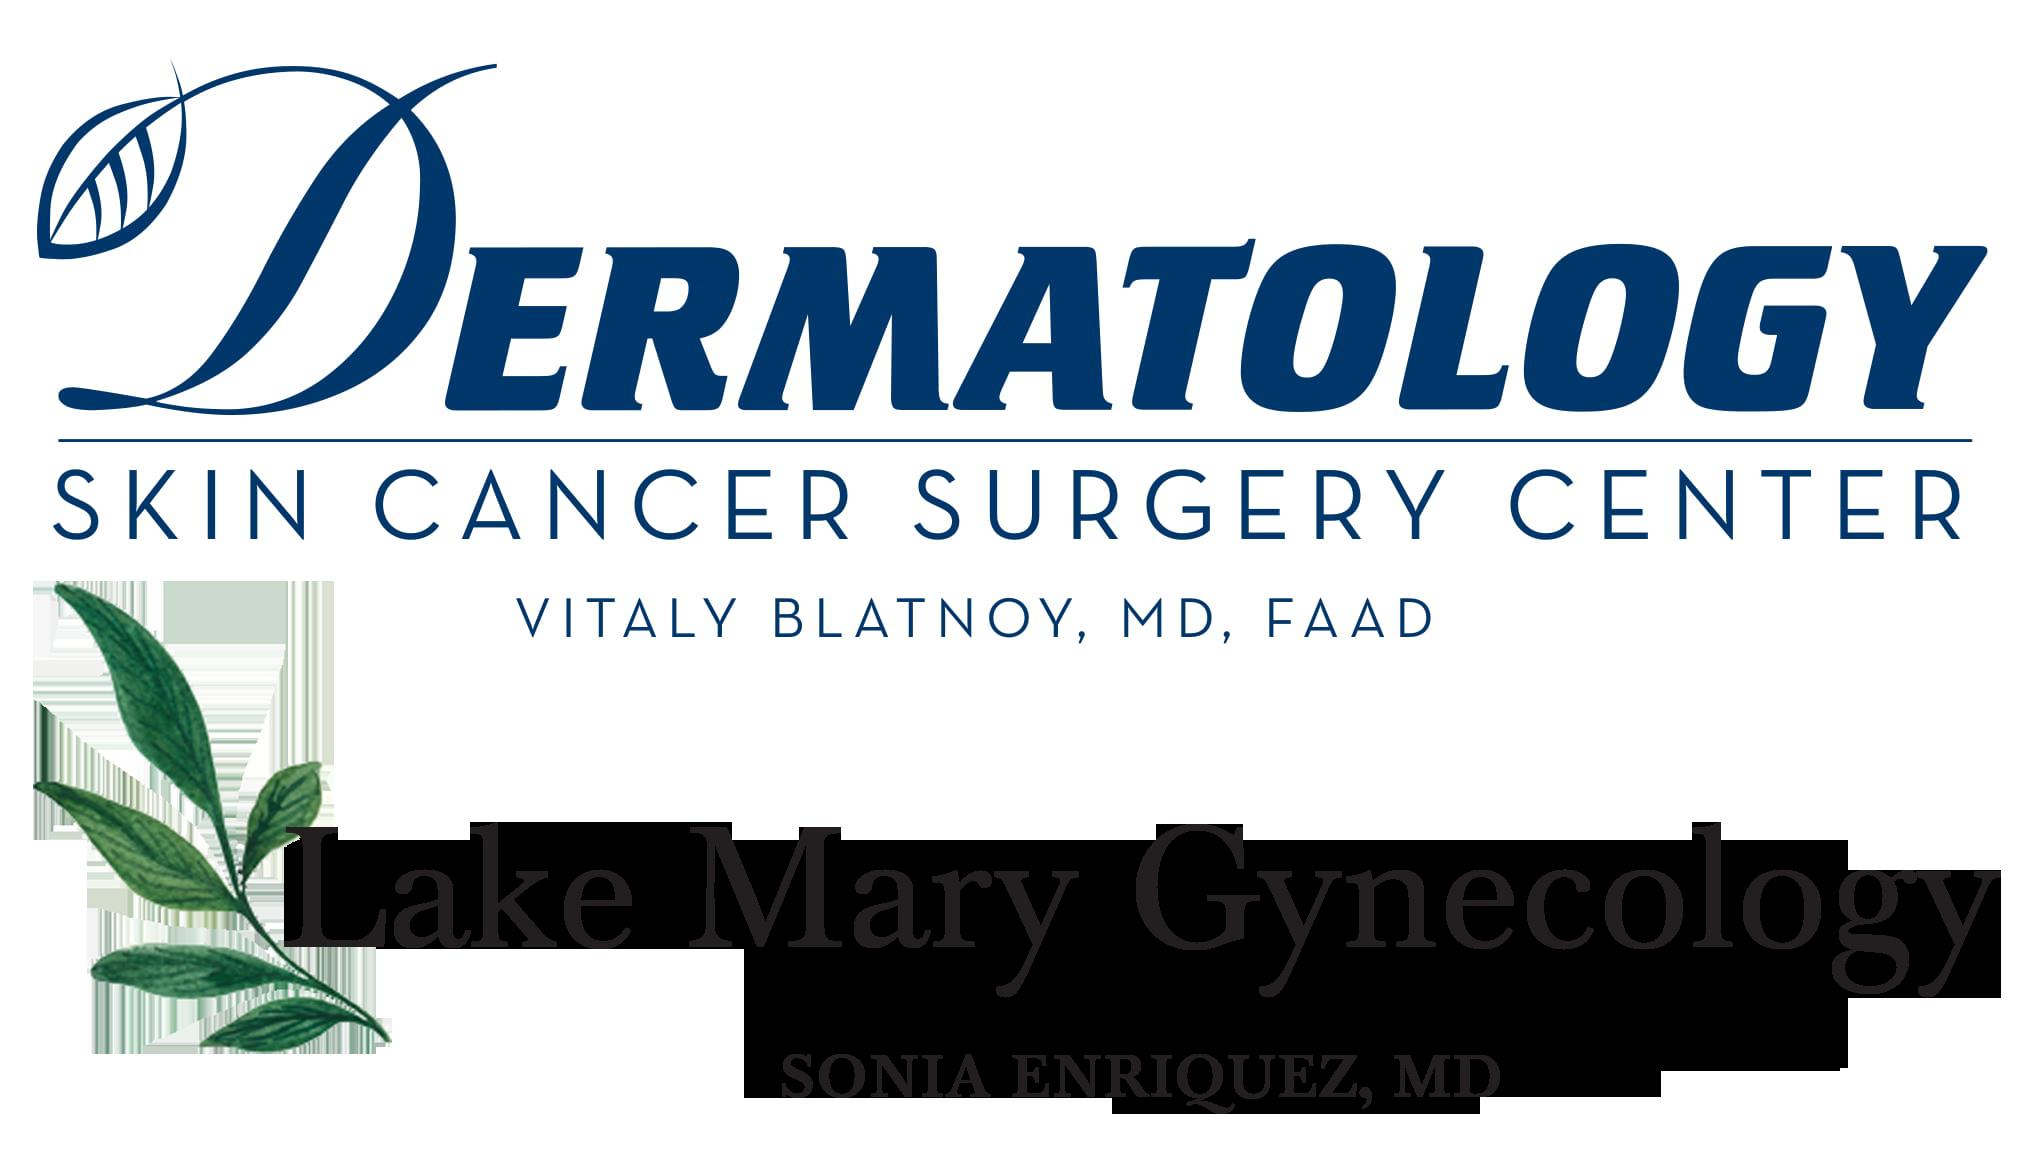 Orlando Dermatology Center